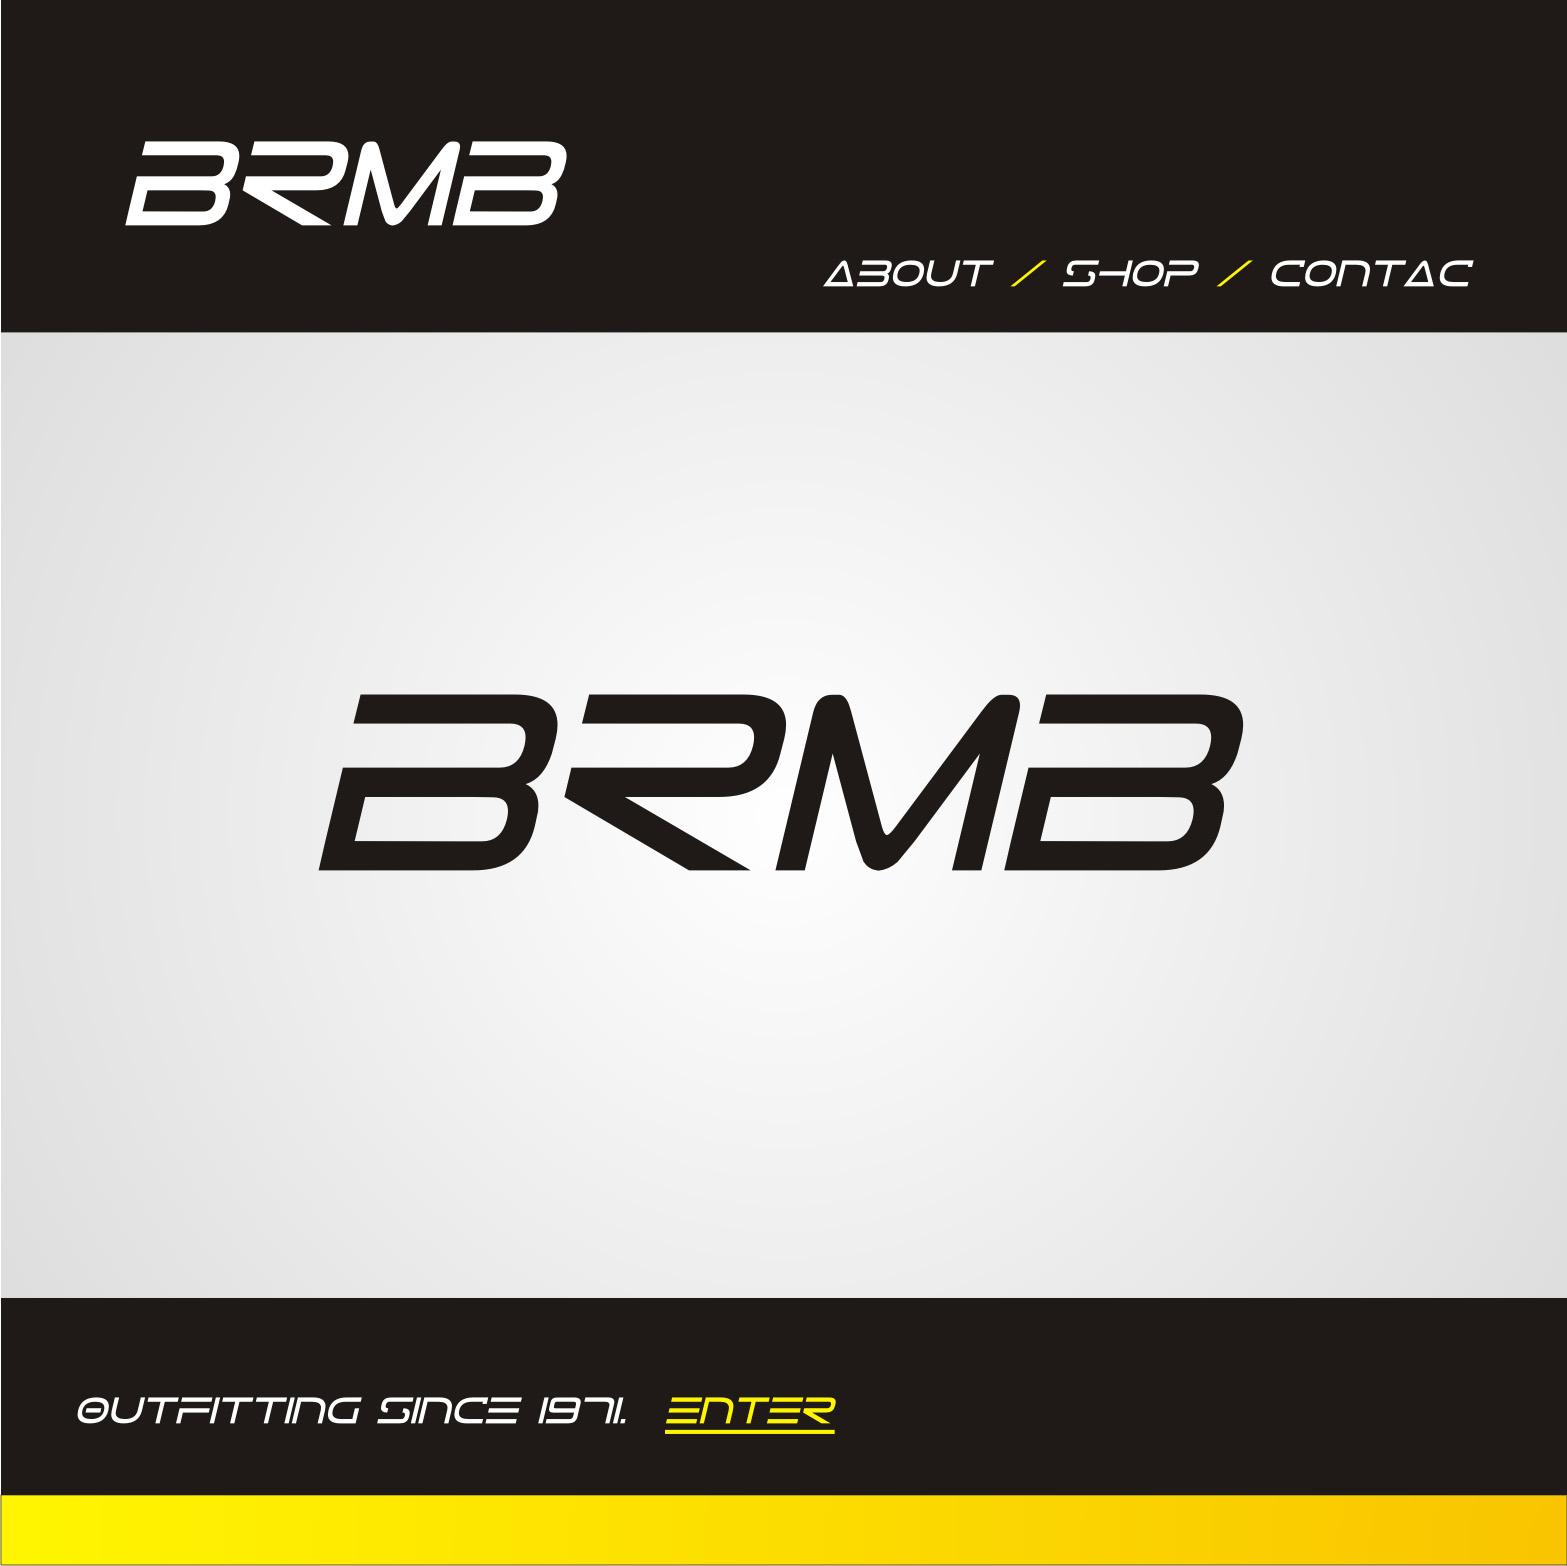 Logo Design by Private User - Entry No. 105 in the Logo Design Contest Fun Logo Design for BRMB.